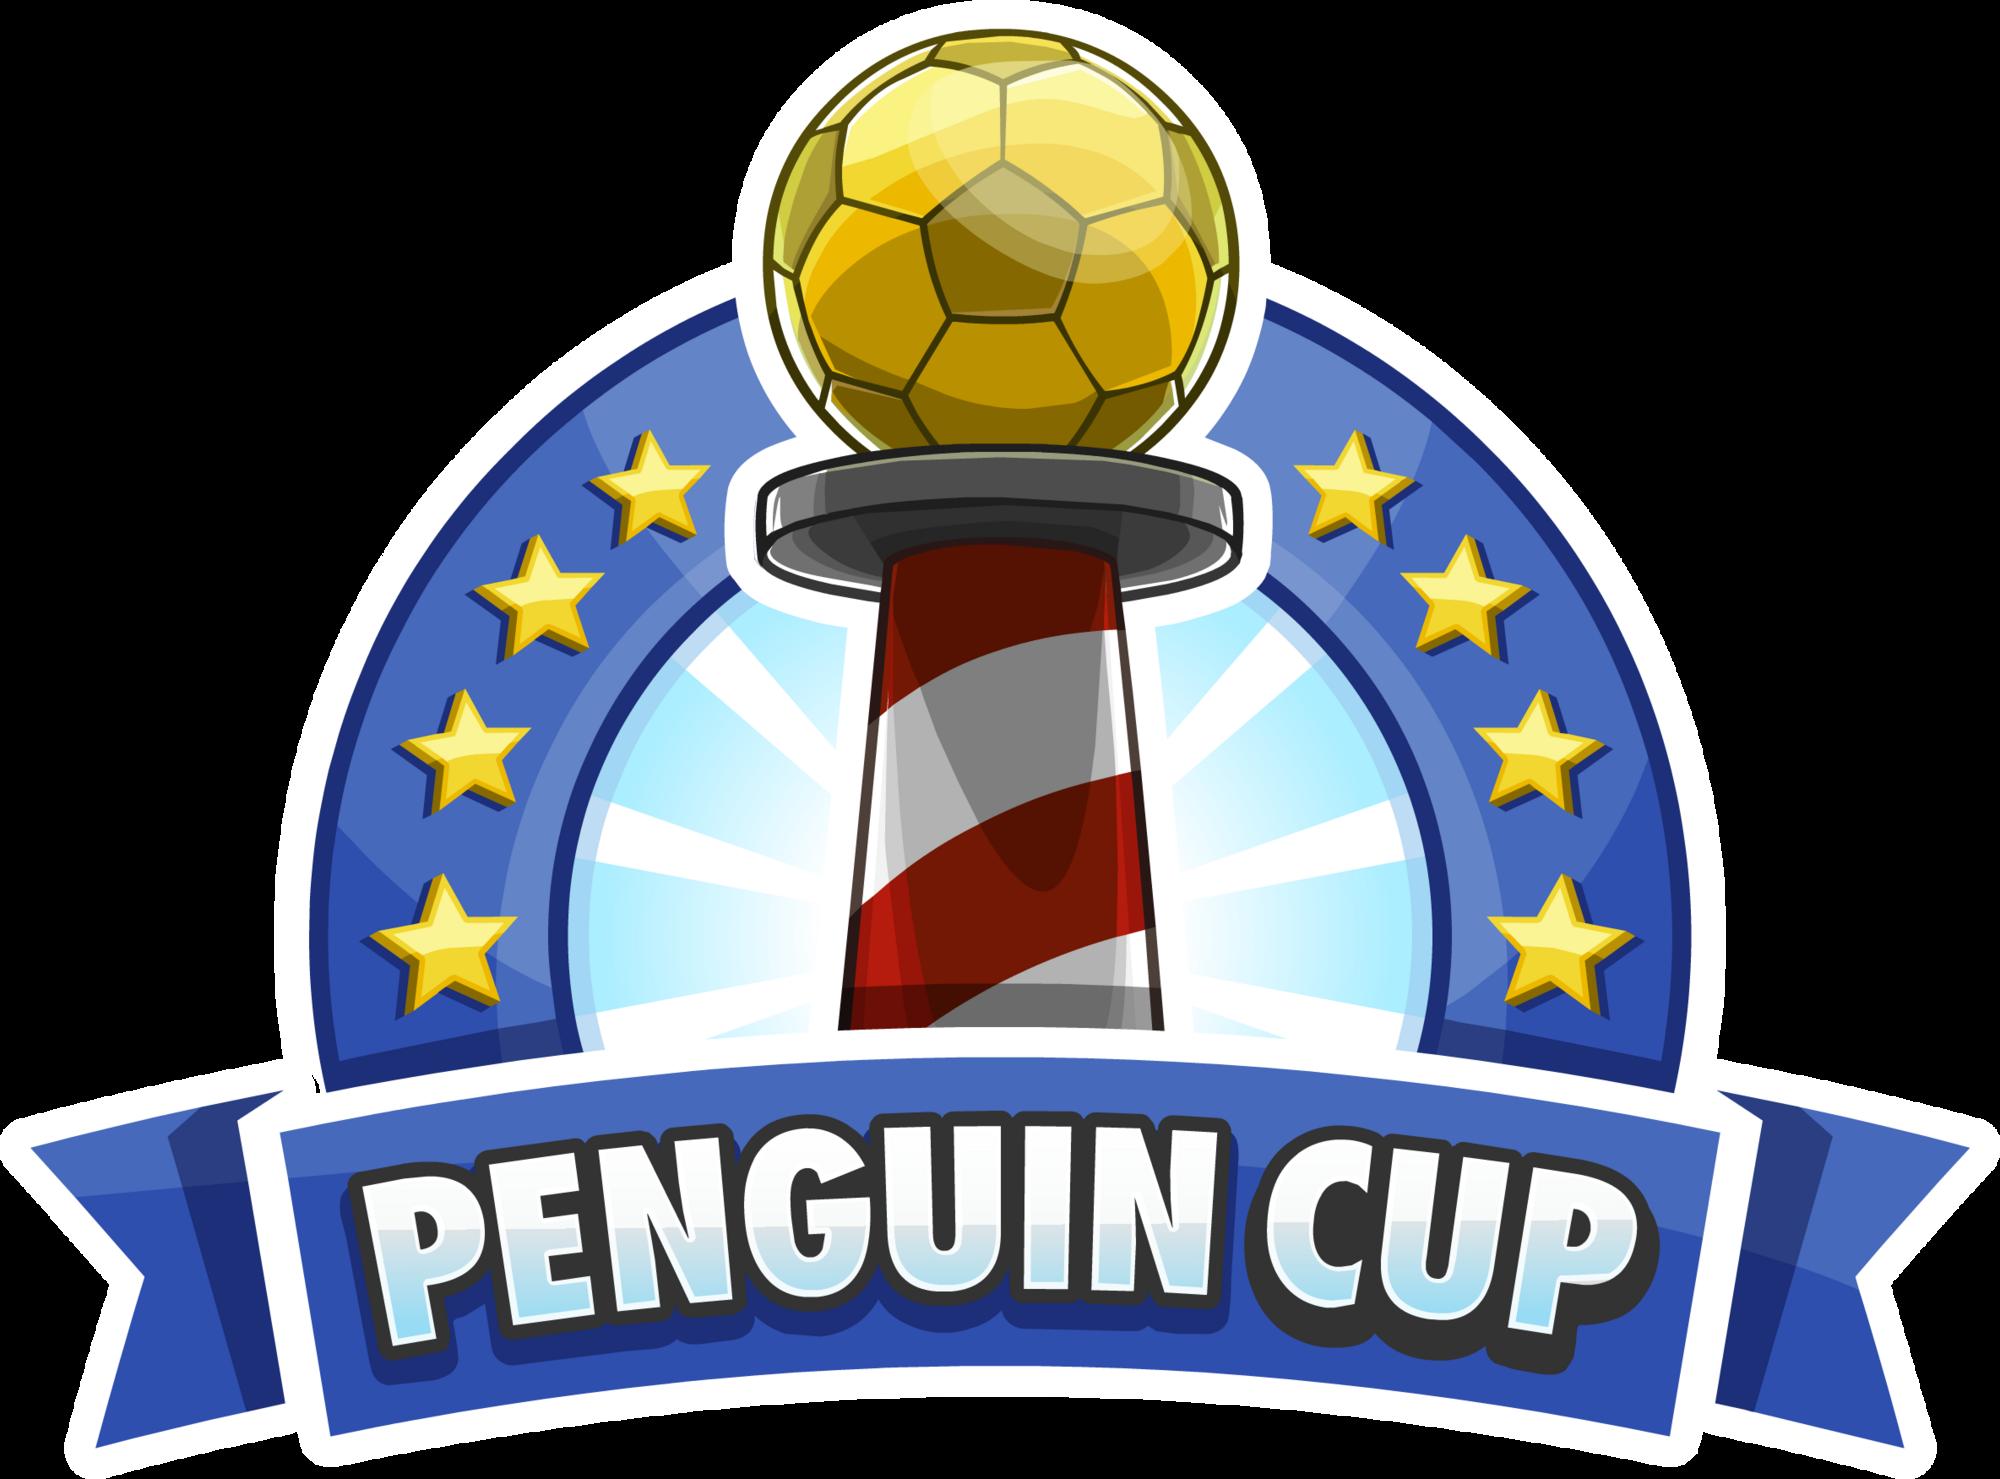 Penguin Cup Club Penguin Wiki